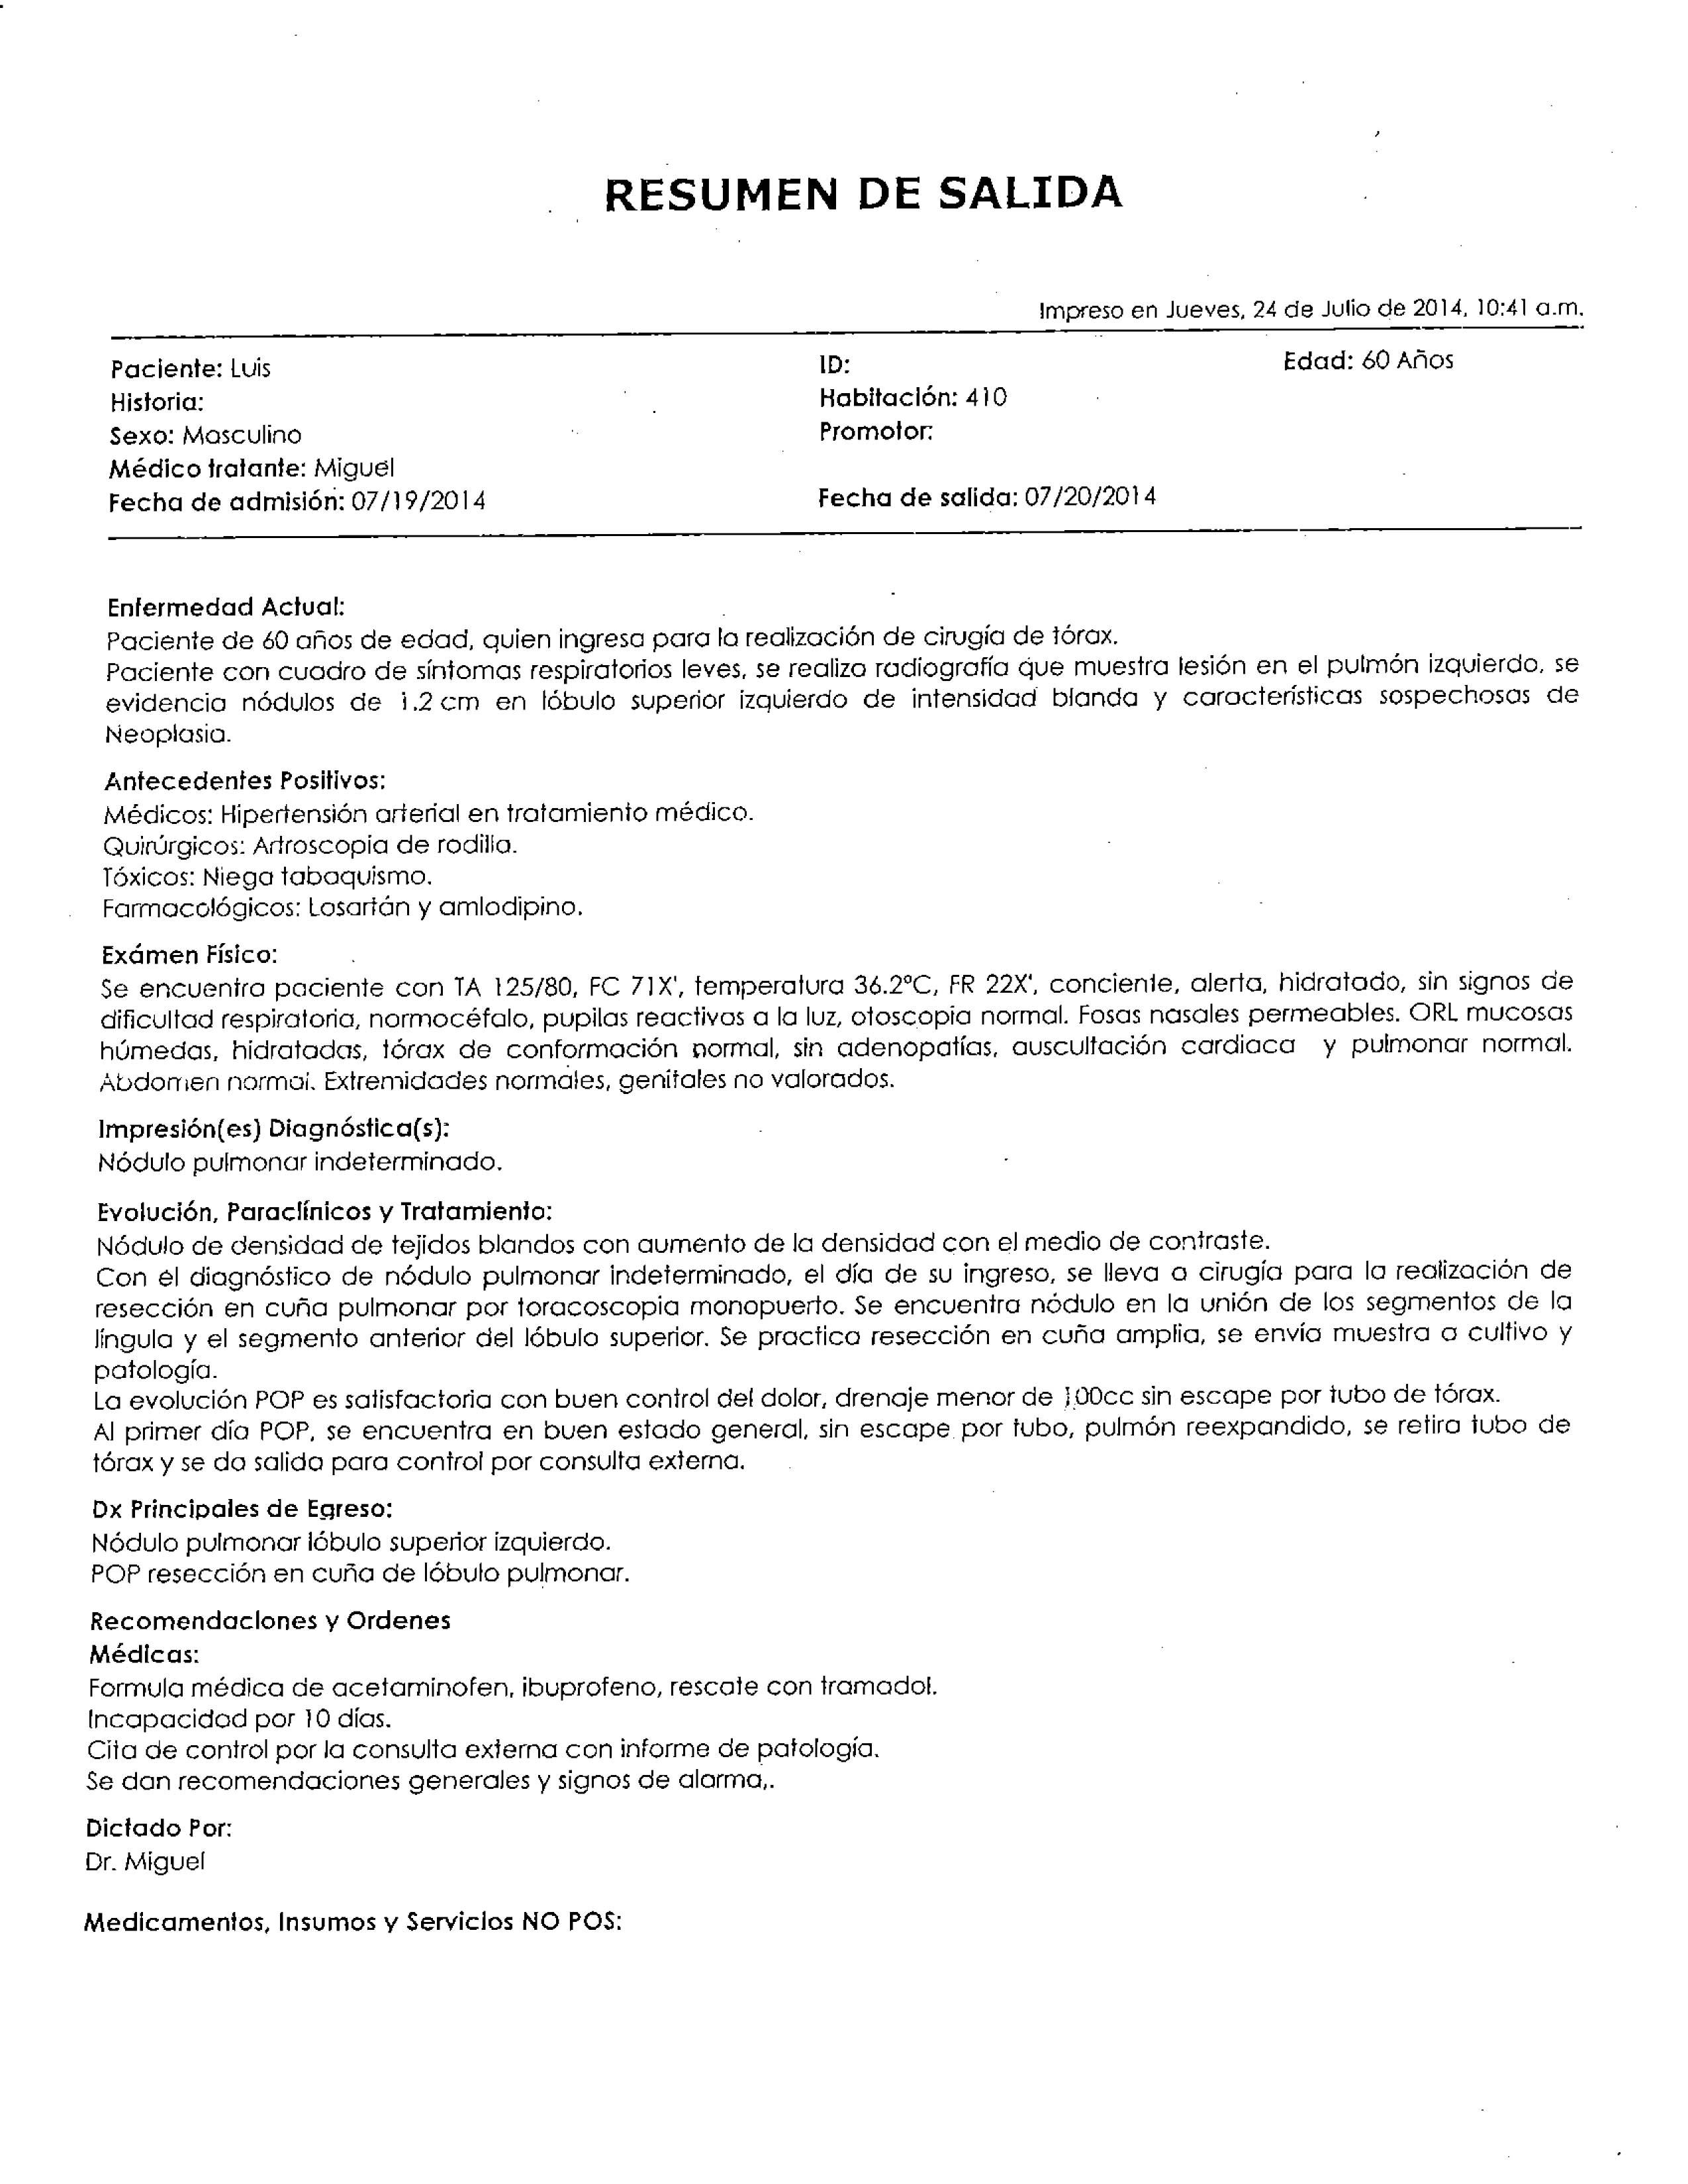 LifEscozul® - Luis 2 - Cáncer de Pulmon